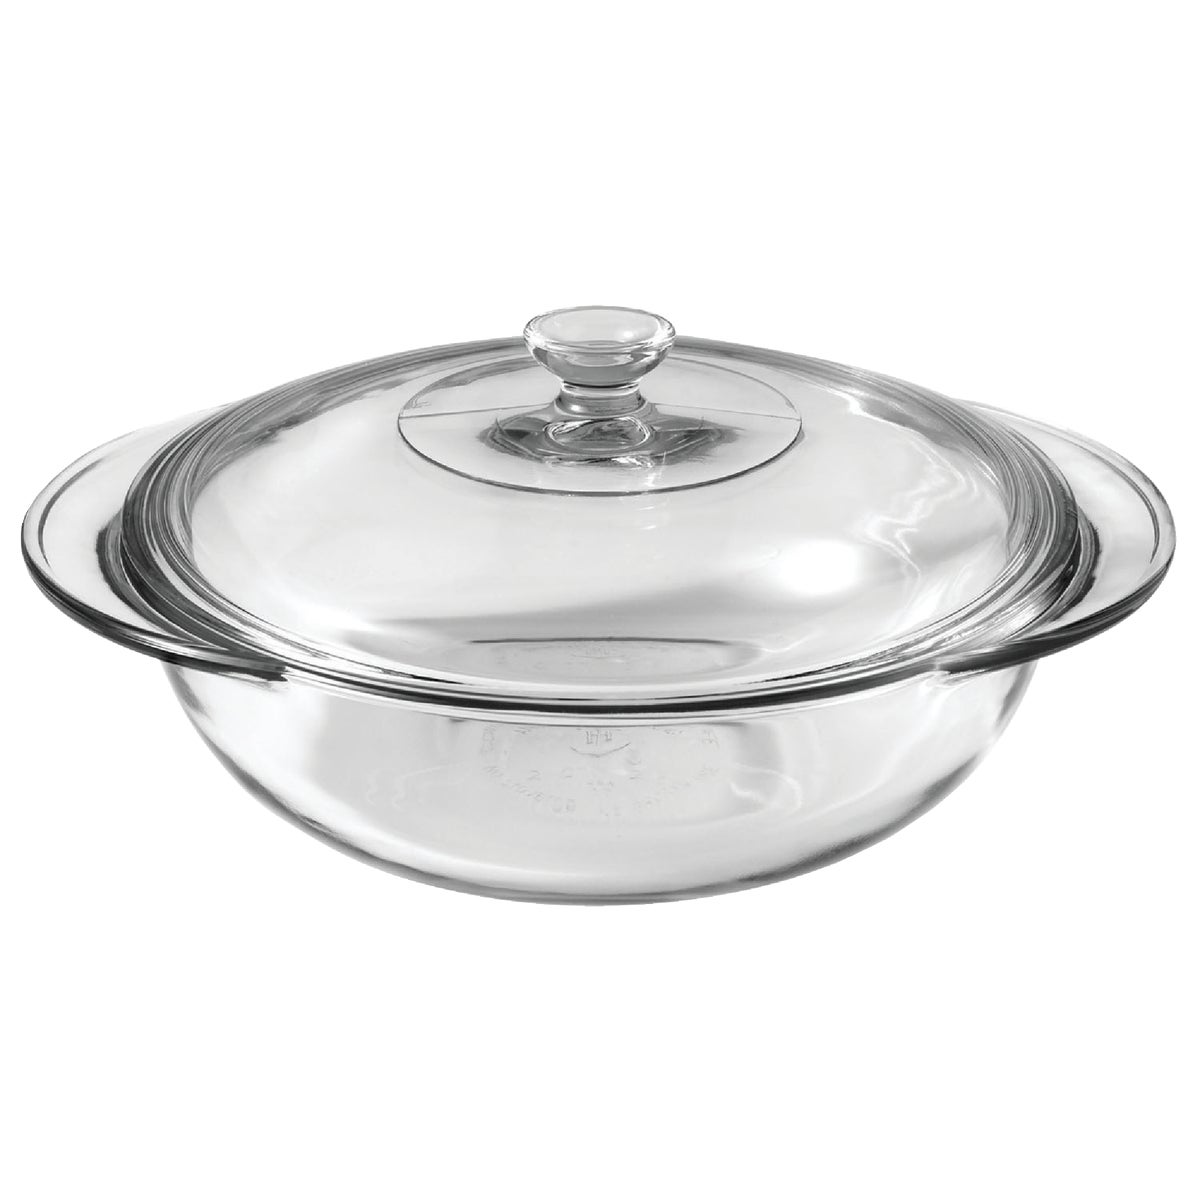 2QT GLASS CASSEROLE DISH